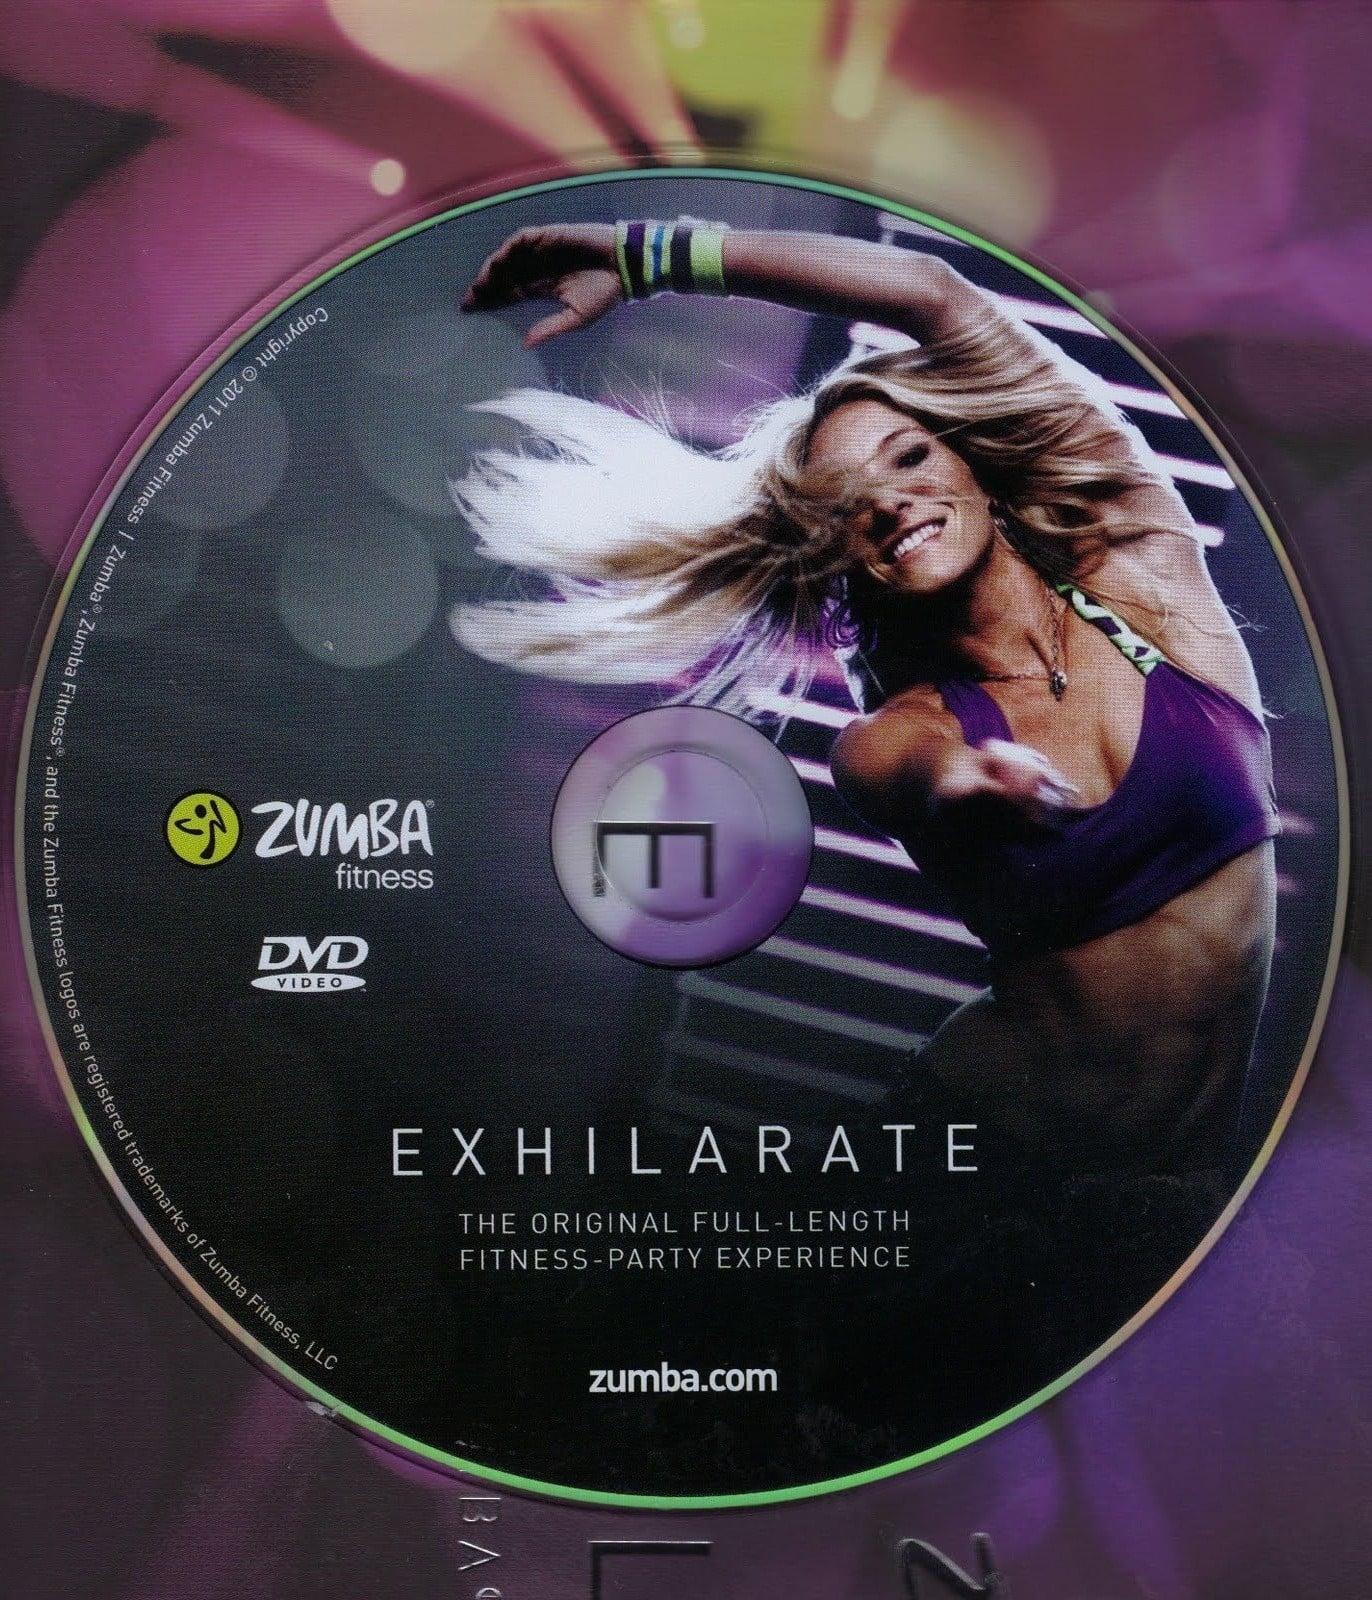 Zumba Fitness Live Dvd: Zumba: Exhilarate (2011